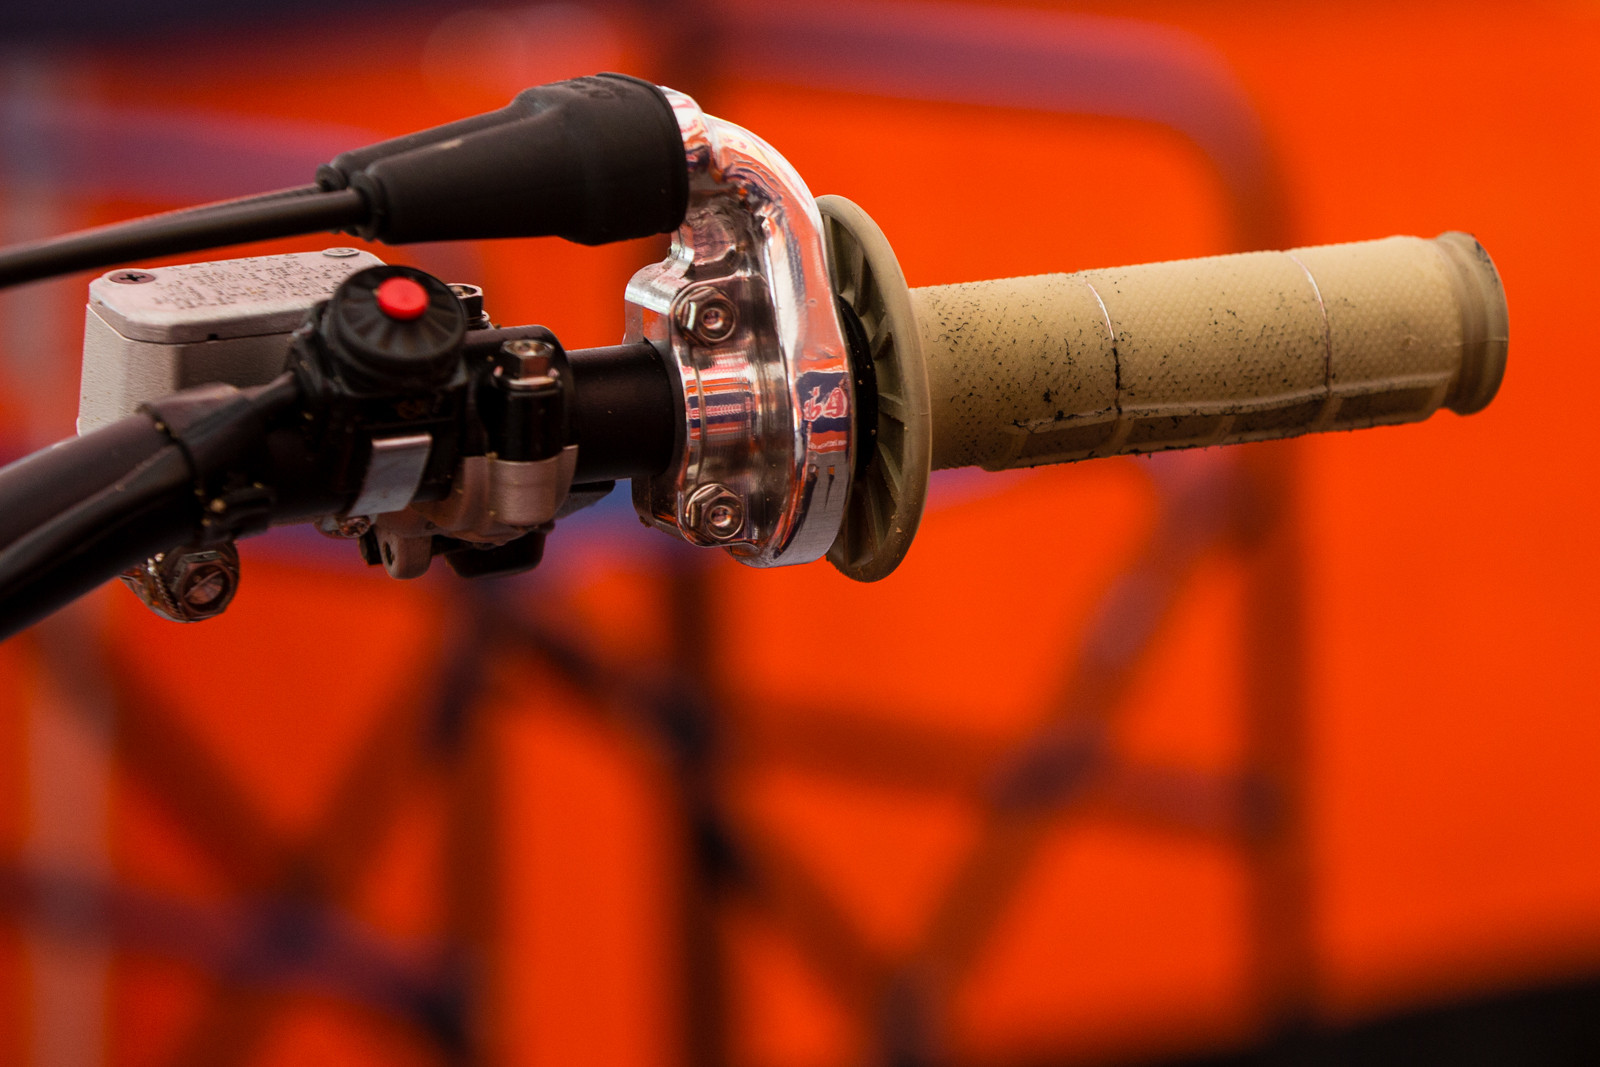 Marvin Musquin - Vital MX Pit Bits: Glen Helen - Motocross Pictures - Vital MX